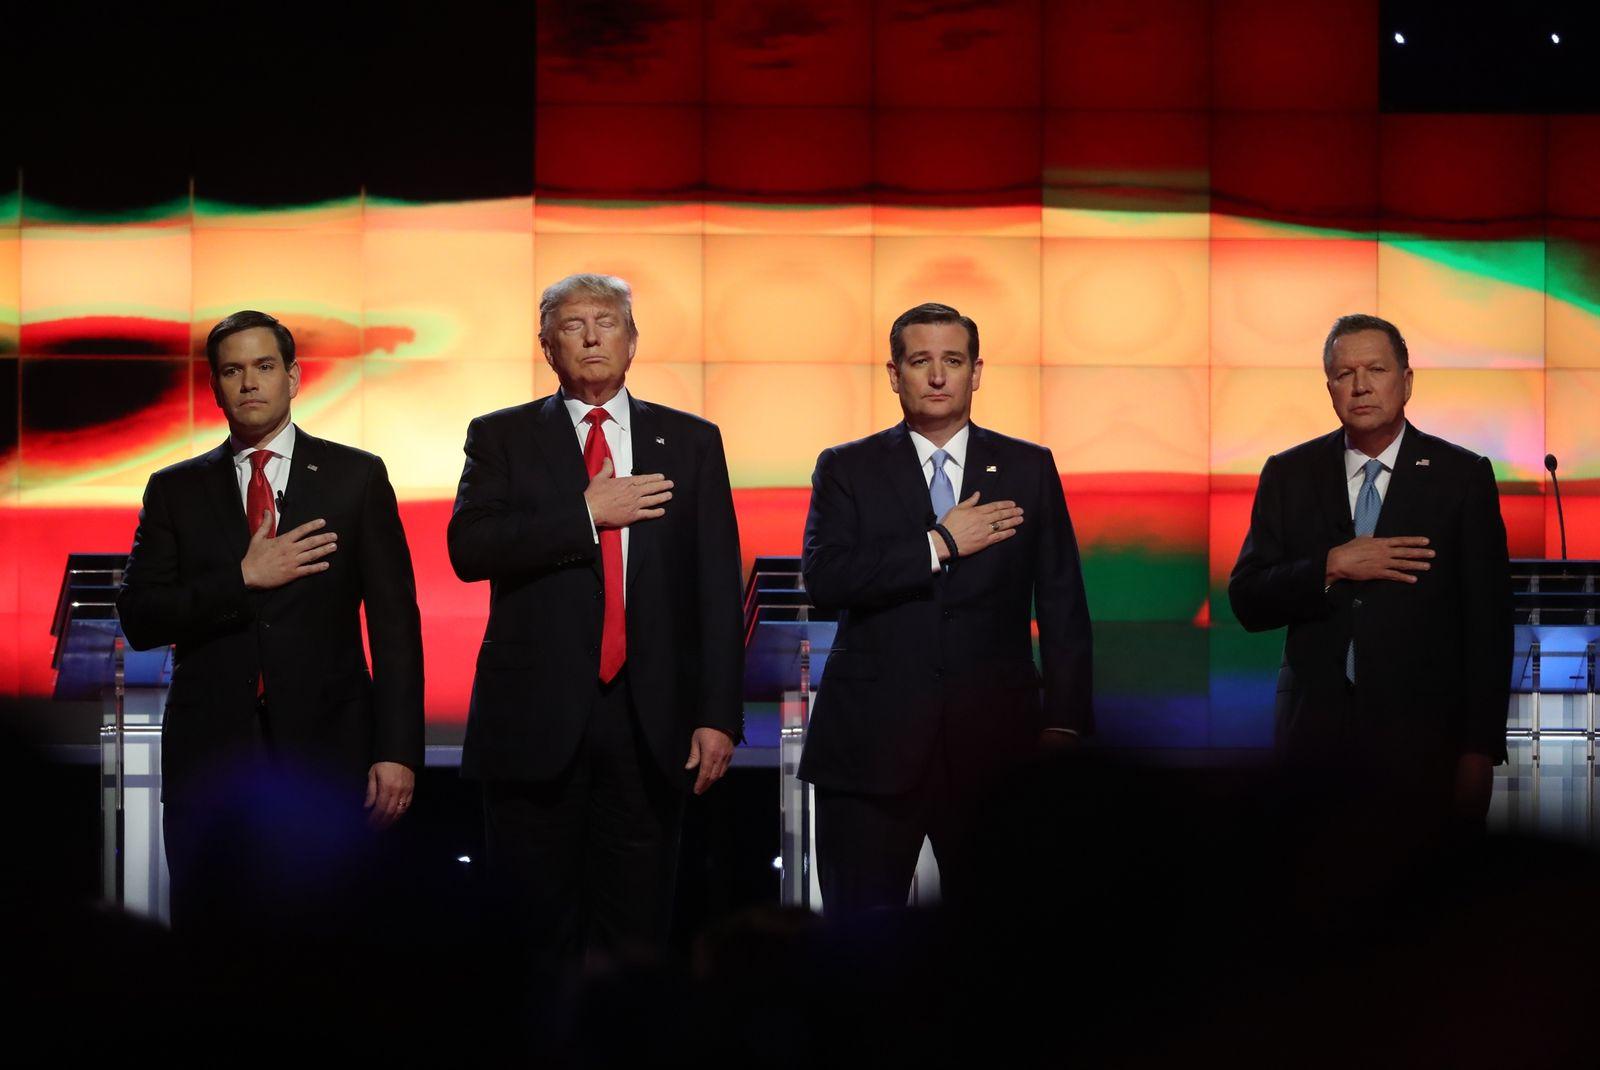 Rubio / Trump / Cruz